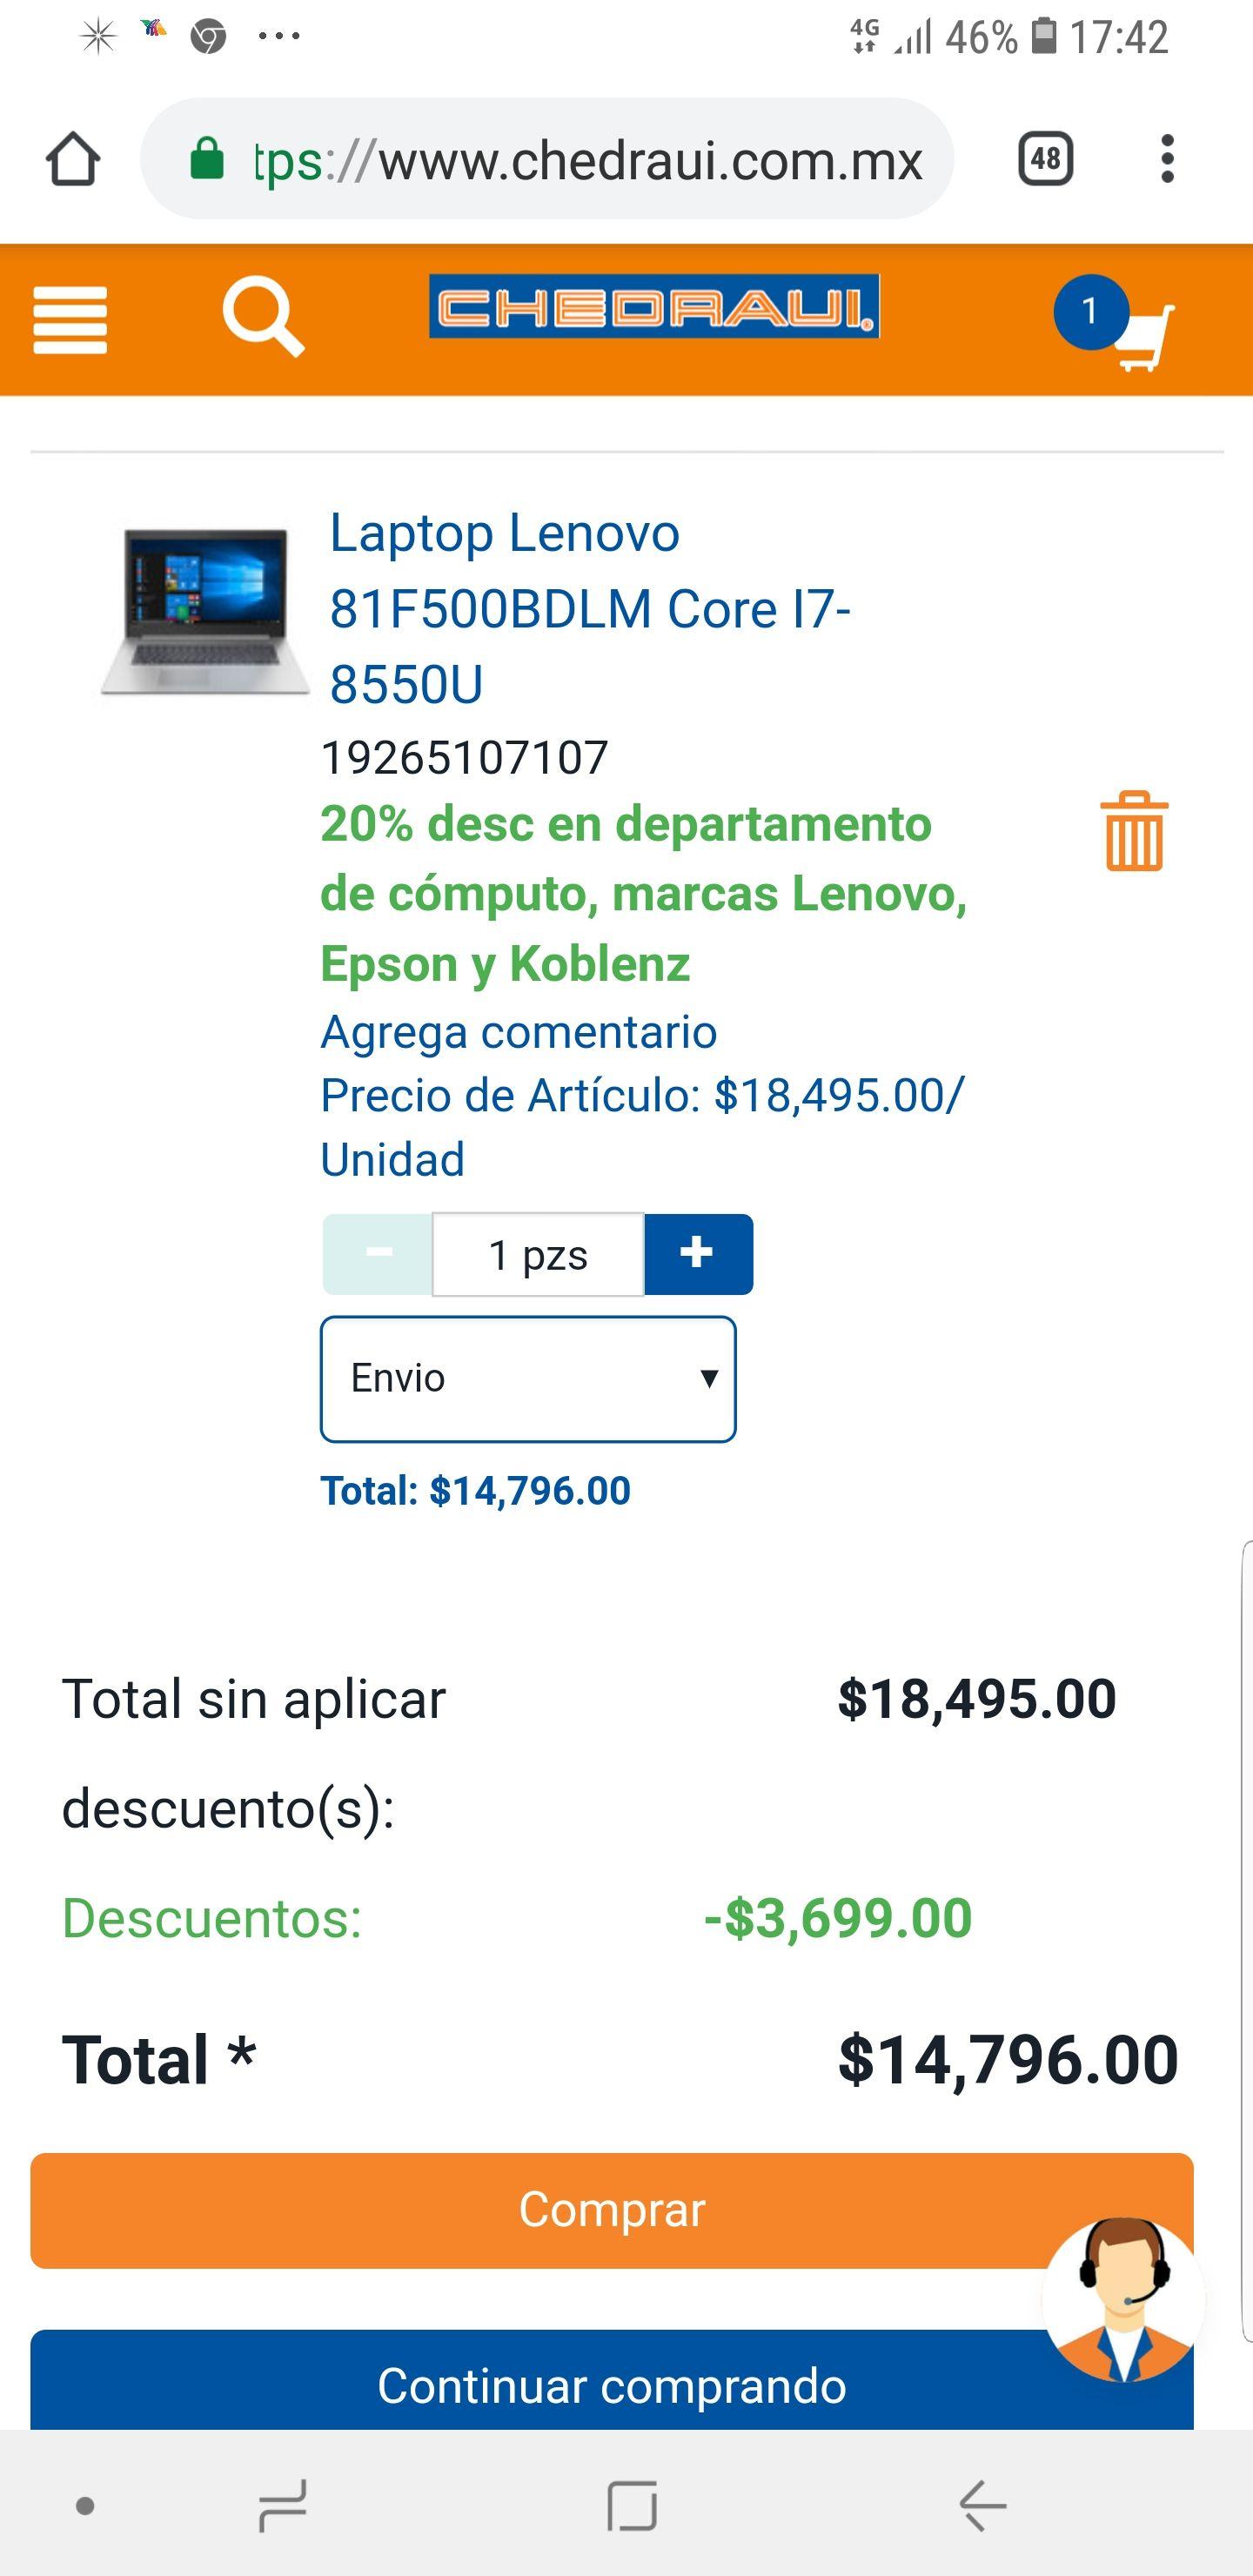 Chedraui: Laptop Lenovo 81F500BDLM Core I7-8550U